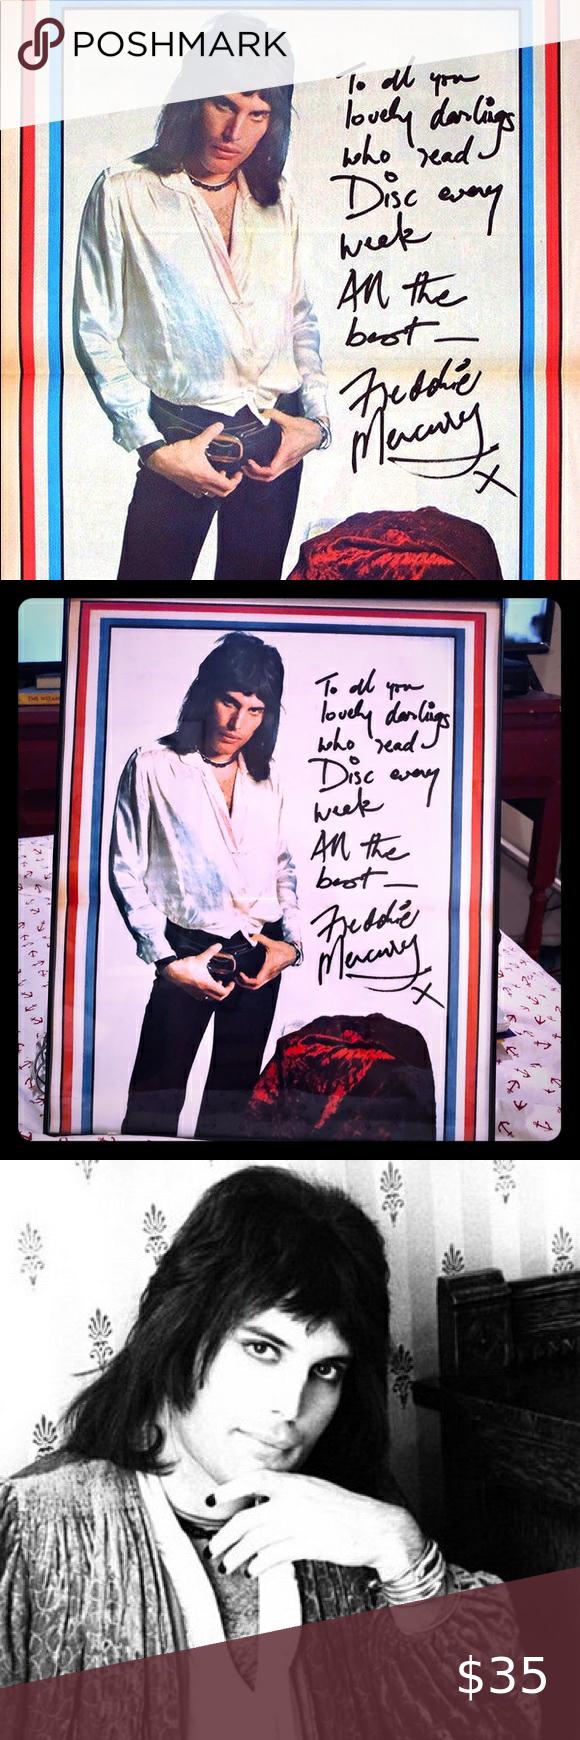 Freddie Mercury Signed 8x10 Framed Photo Reprint Photo Frame Freddie Mercury Somebody To Love